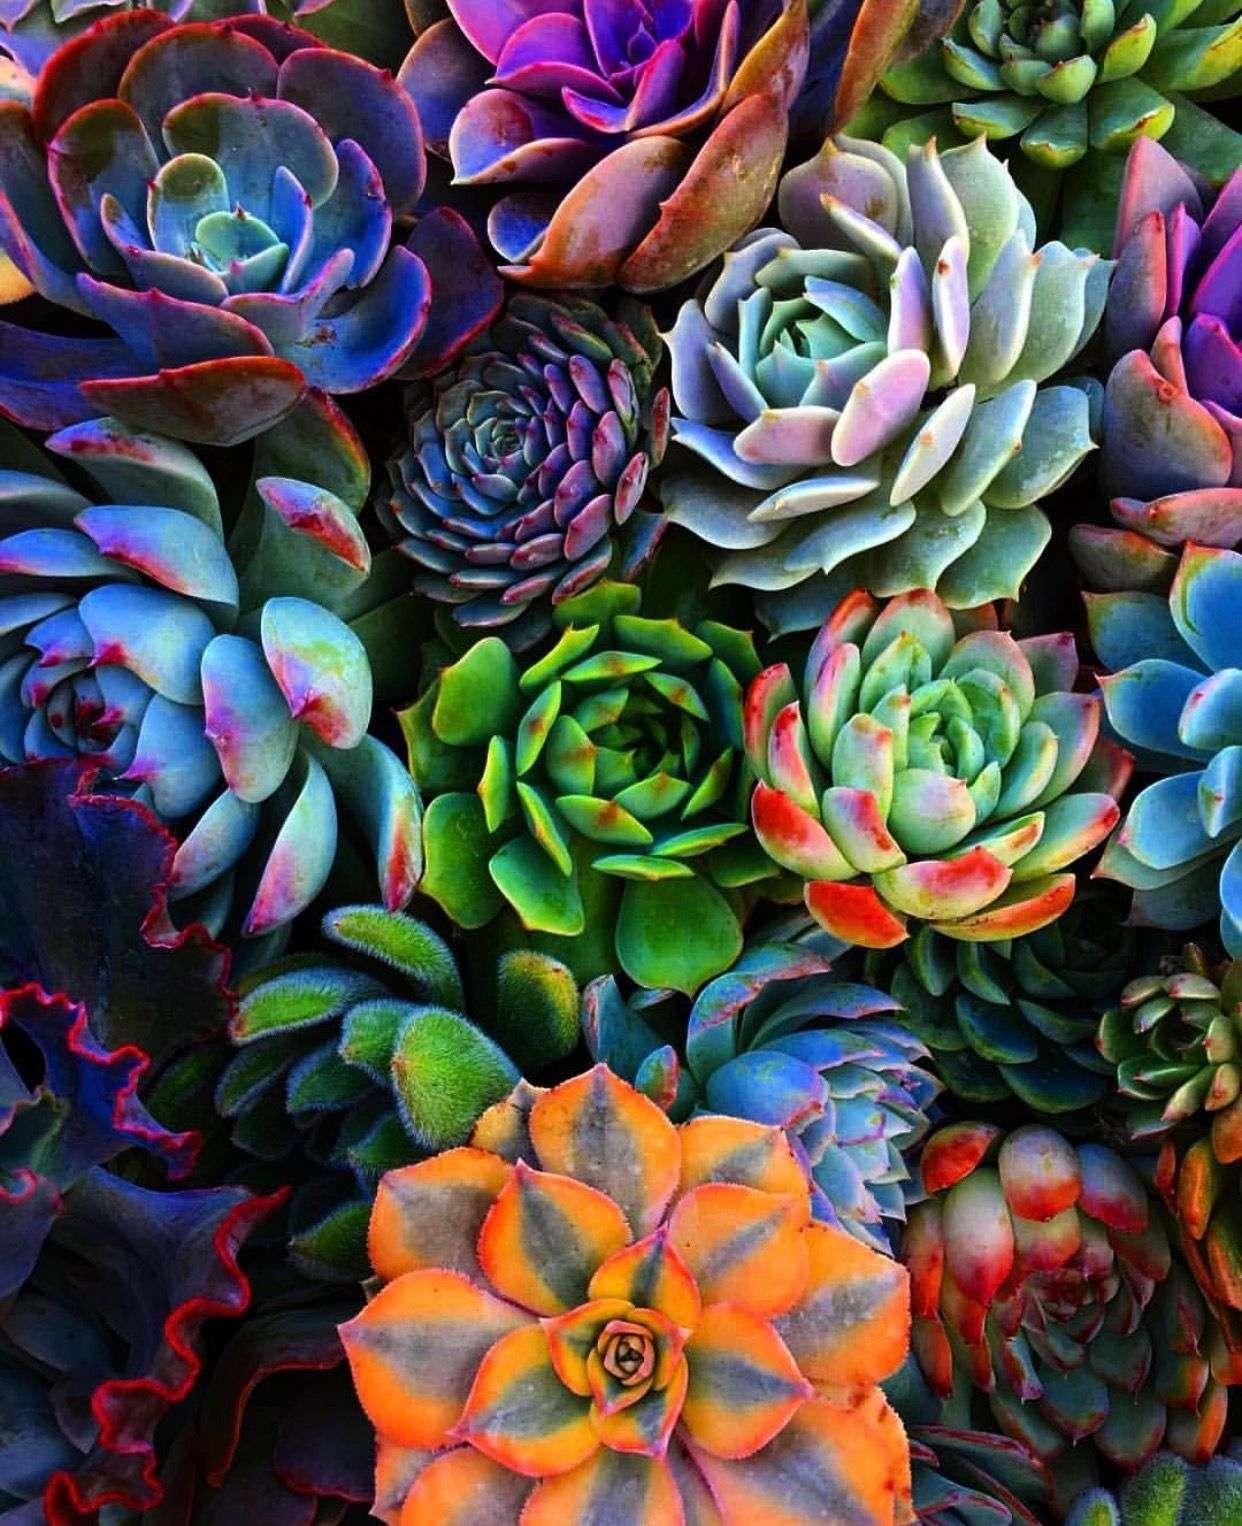 Bright-colored Succulents